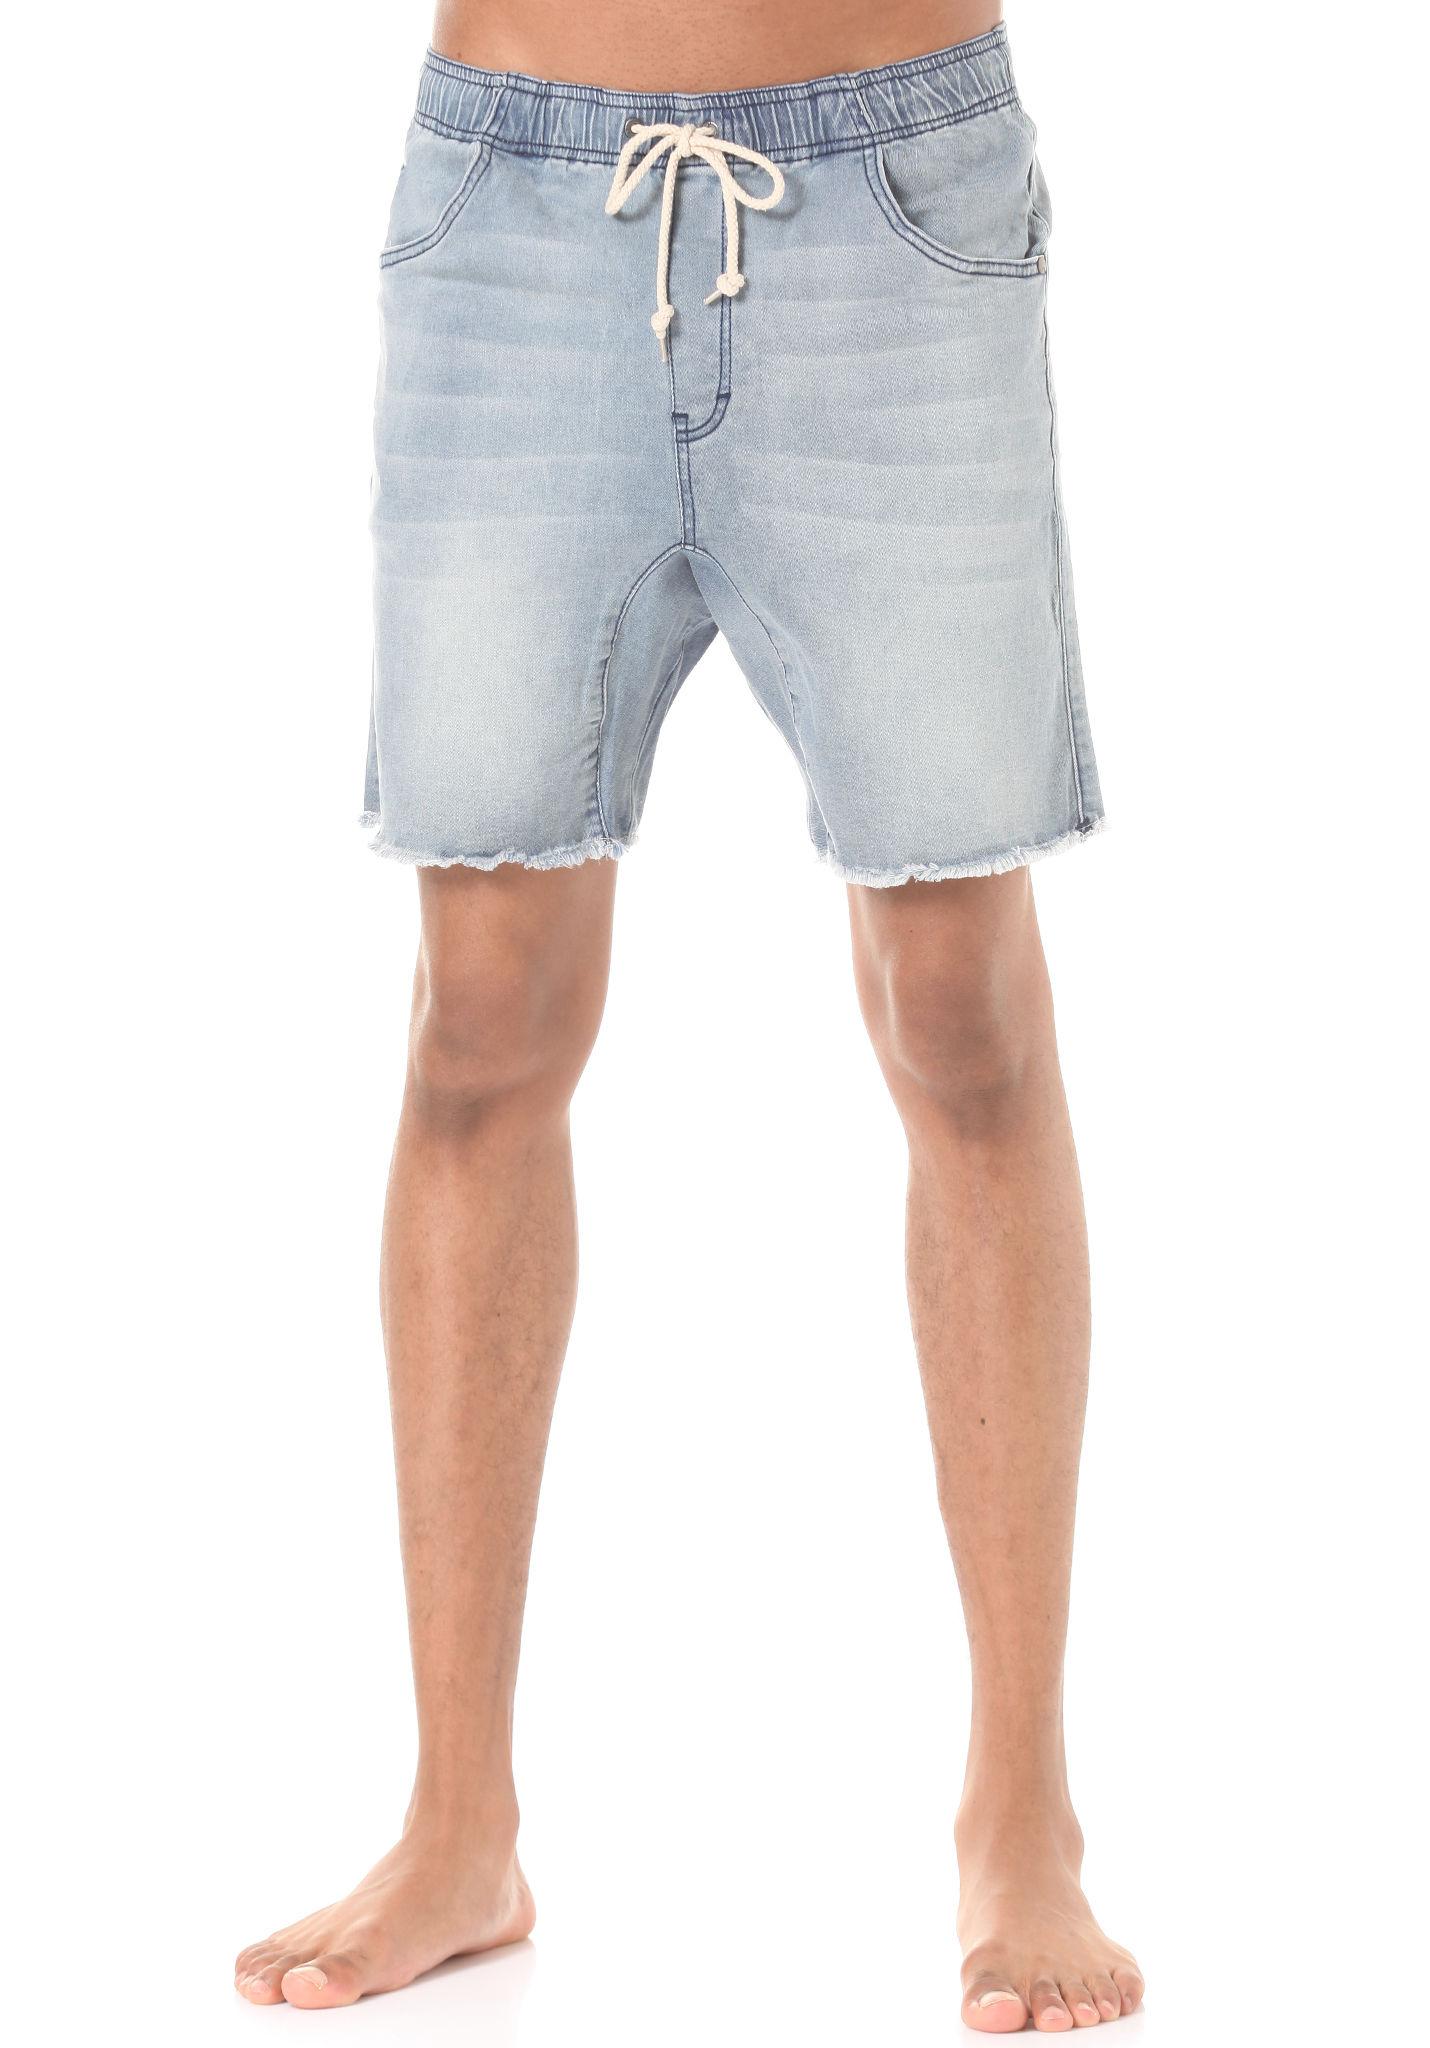 denim shorts for men rusty baller denim - shorts for men - blue - planet sports BKGQGUT